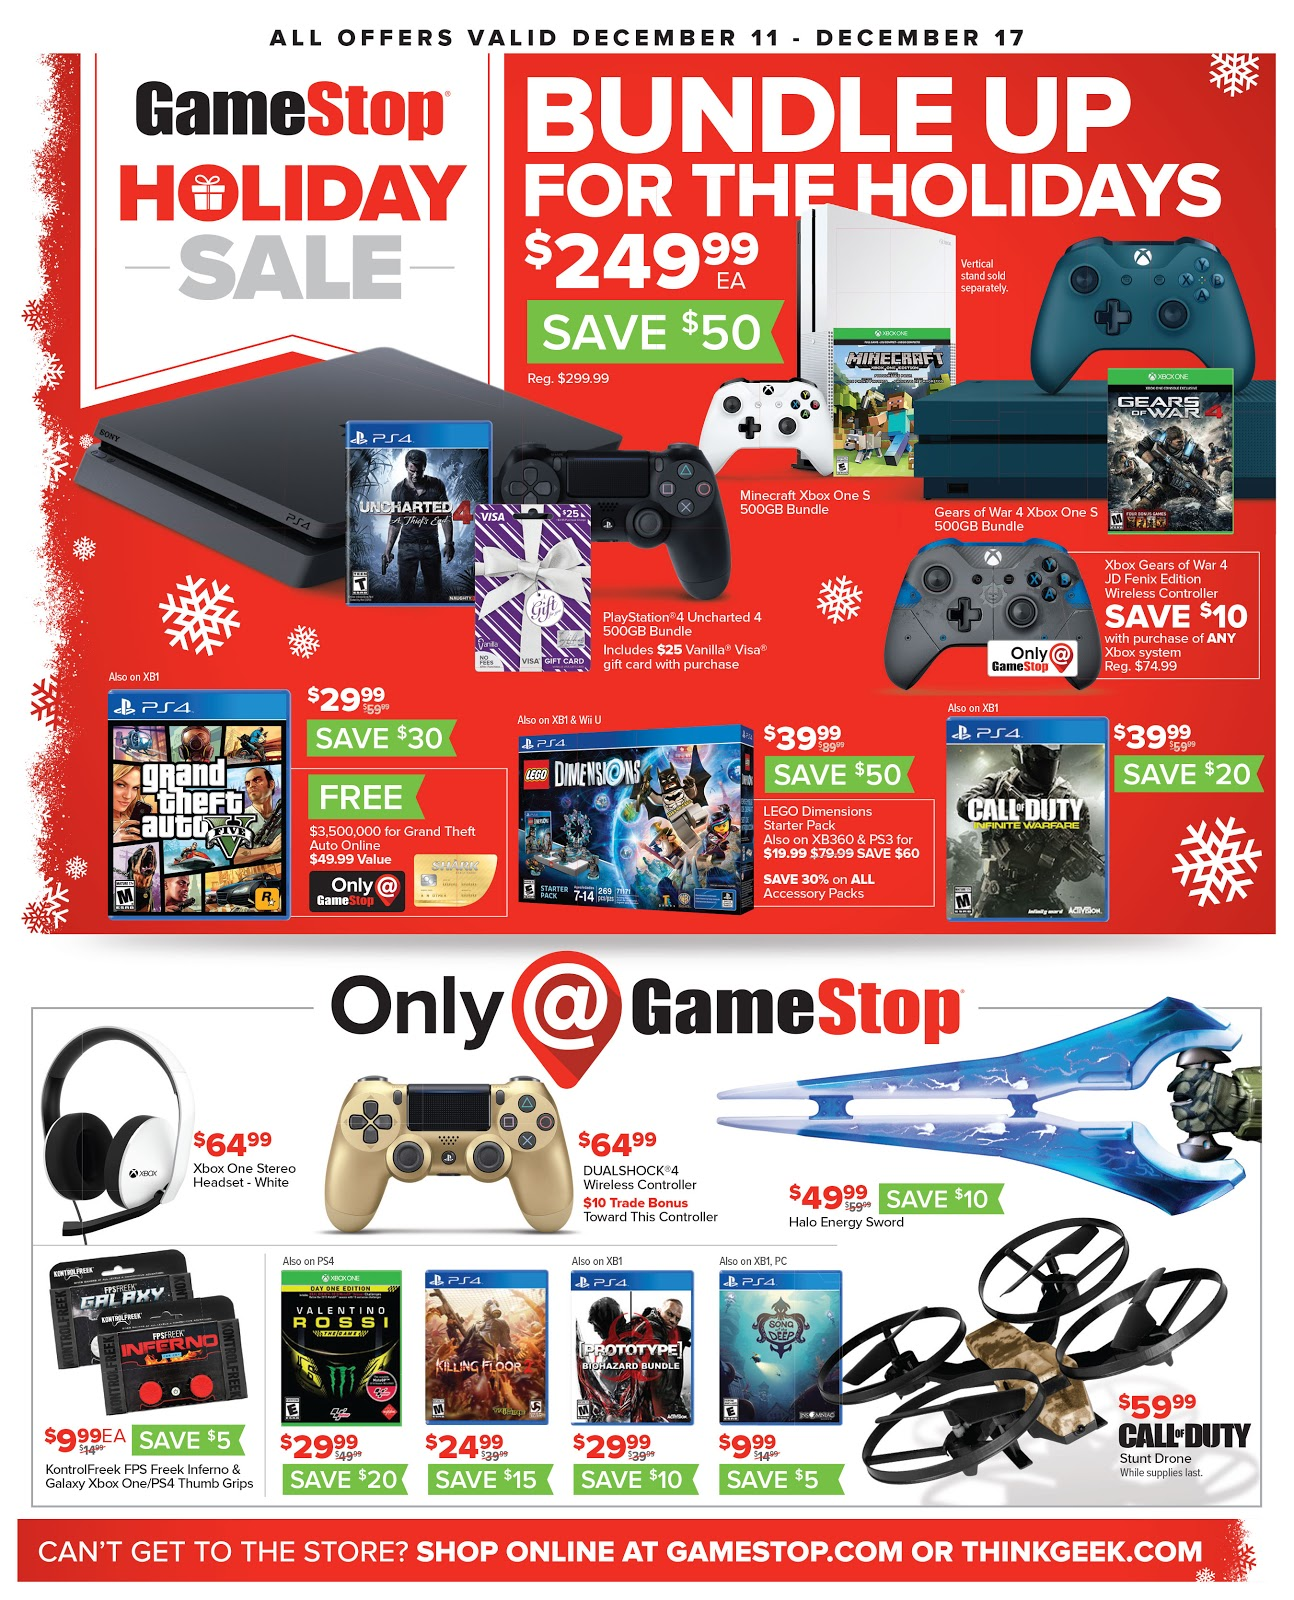 Screenshot showing a GameStop promotional banner